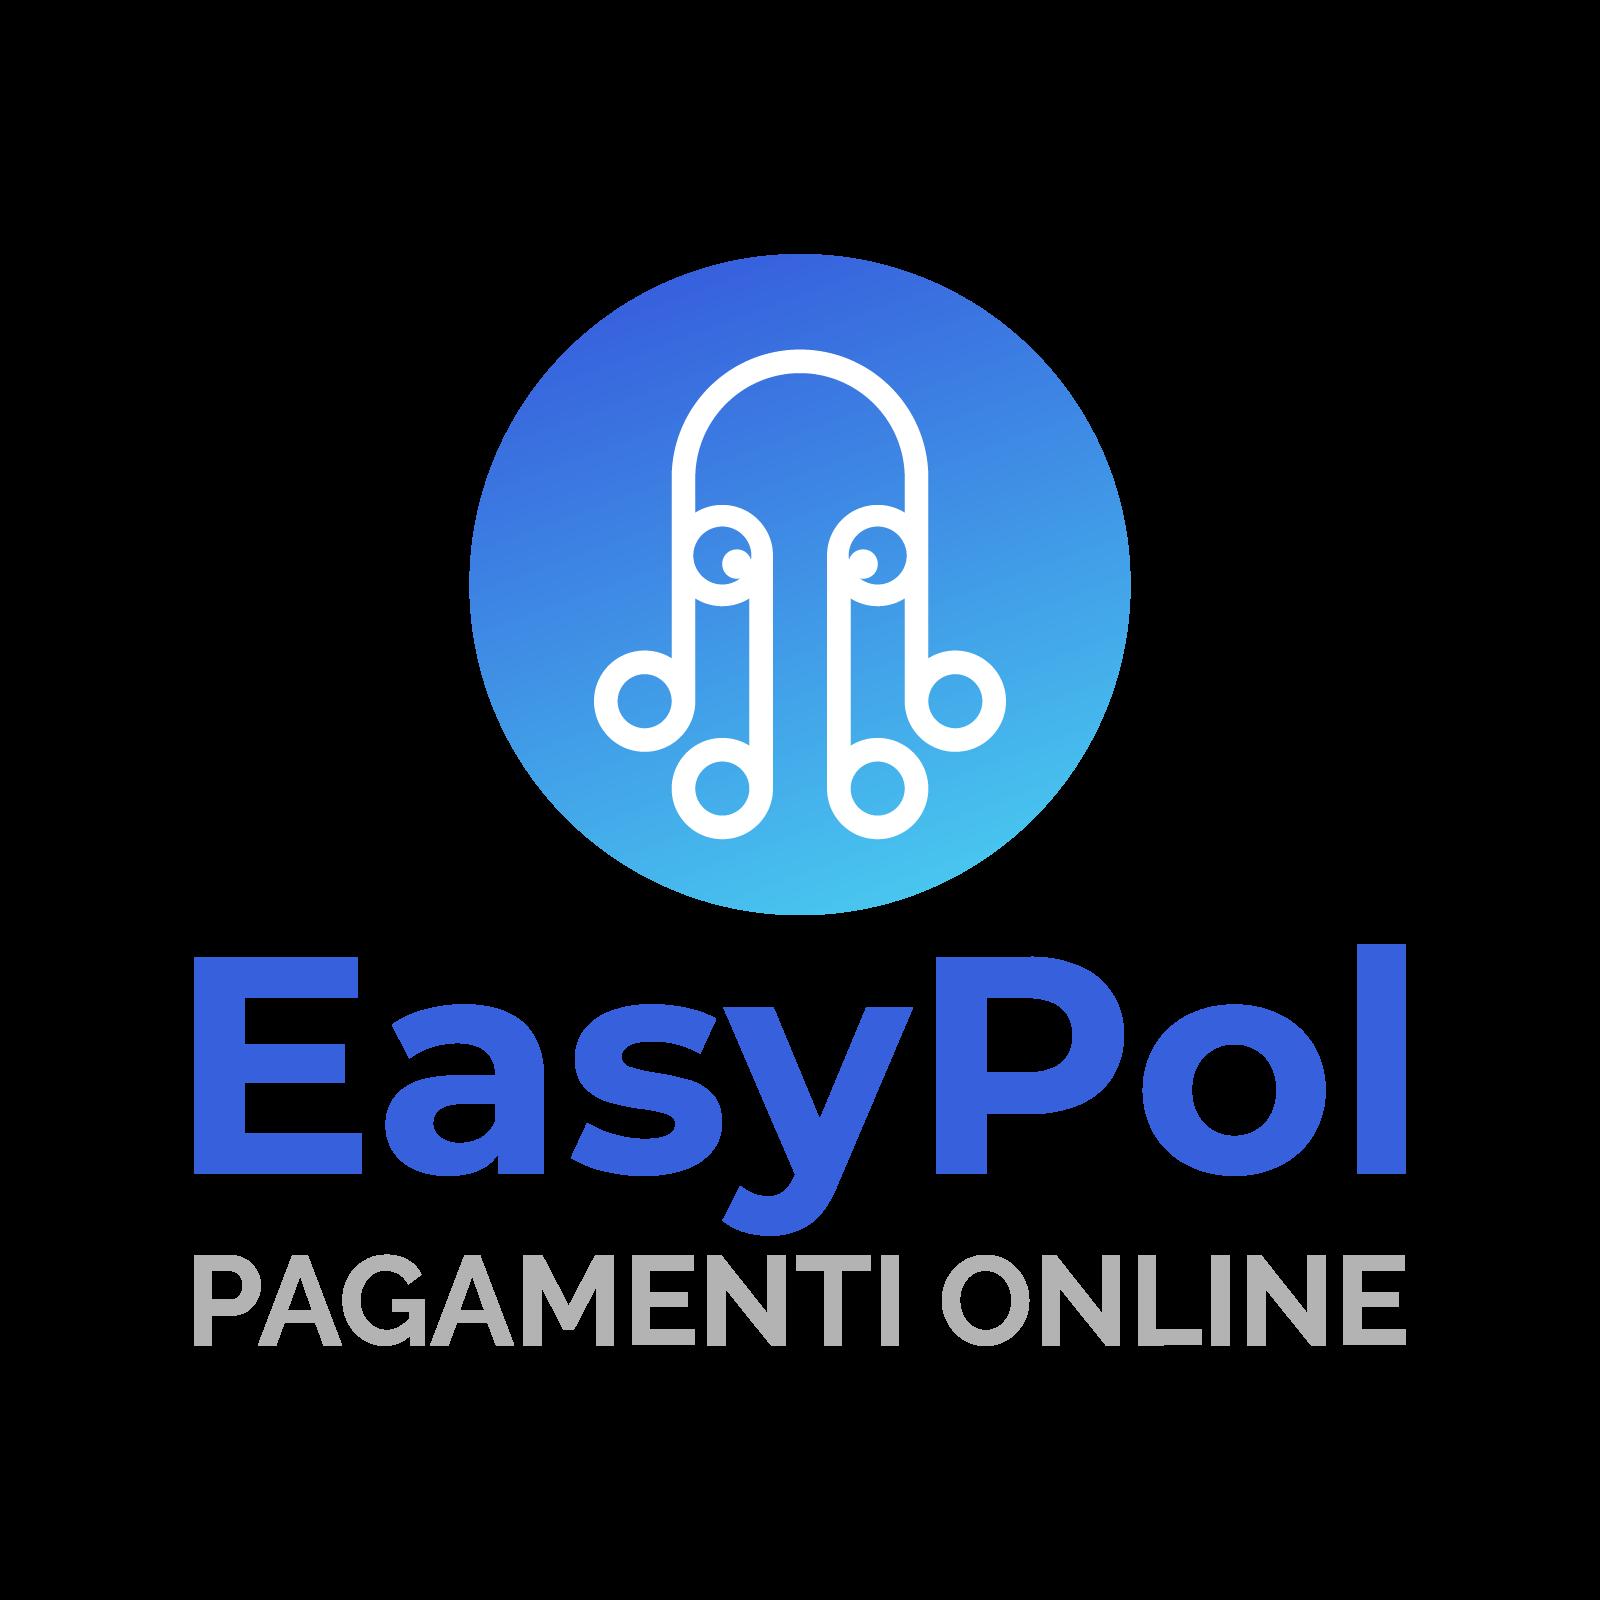 EasyPol - Pagamenti digitali PagoPA